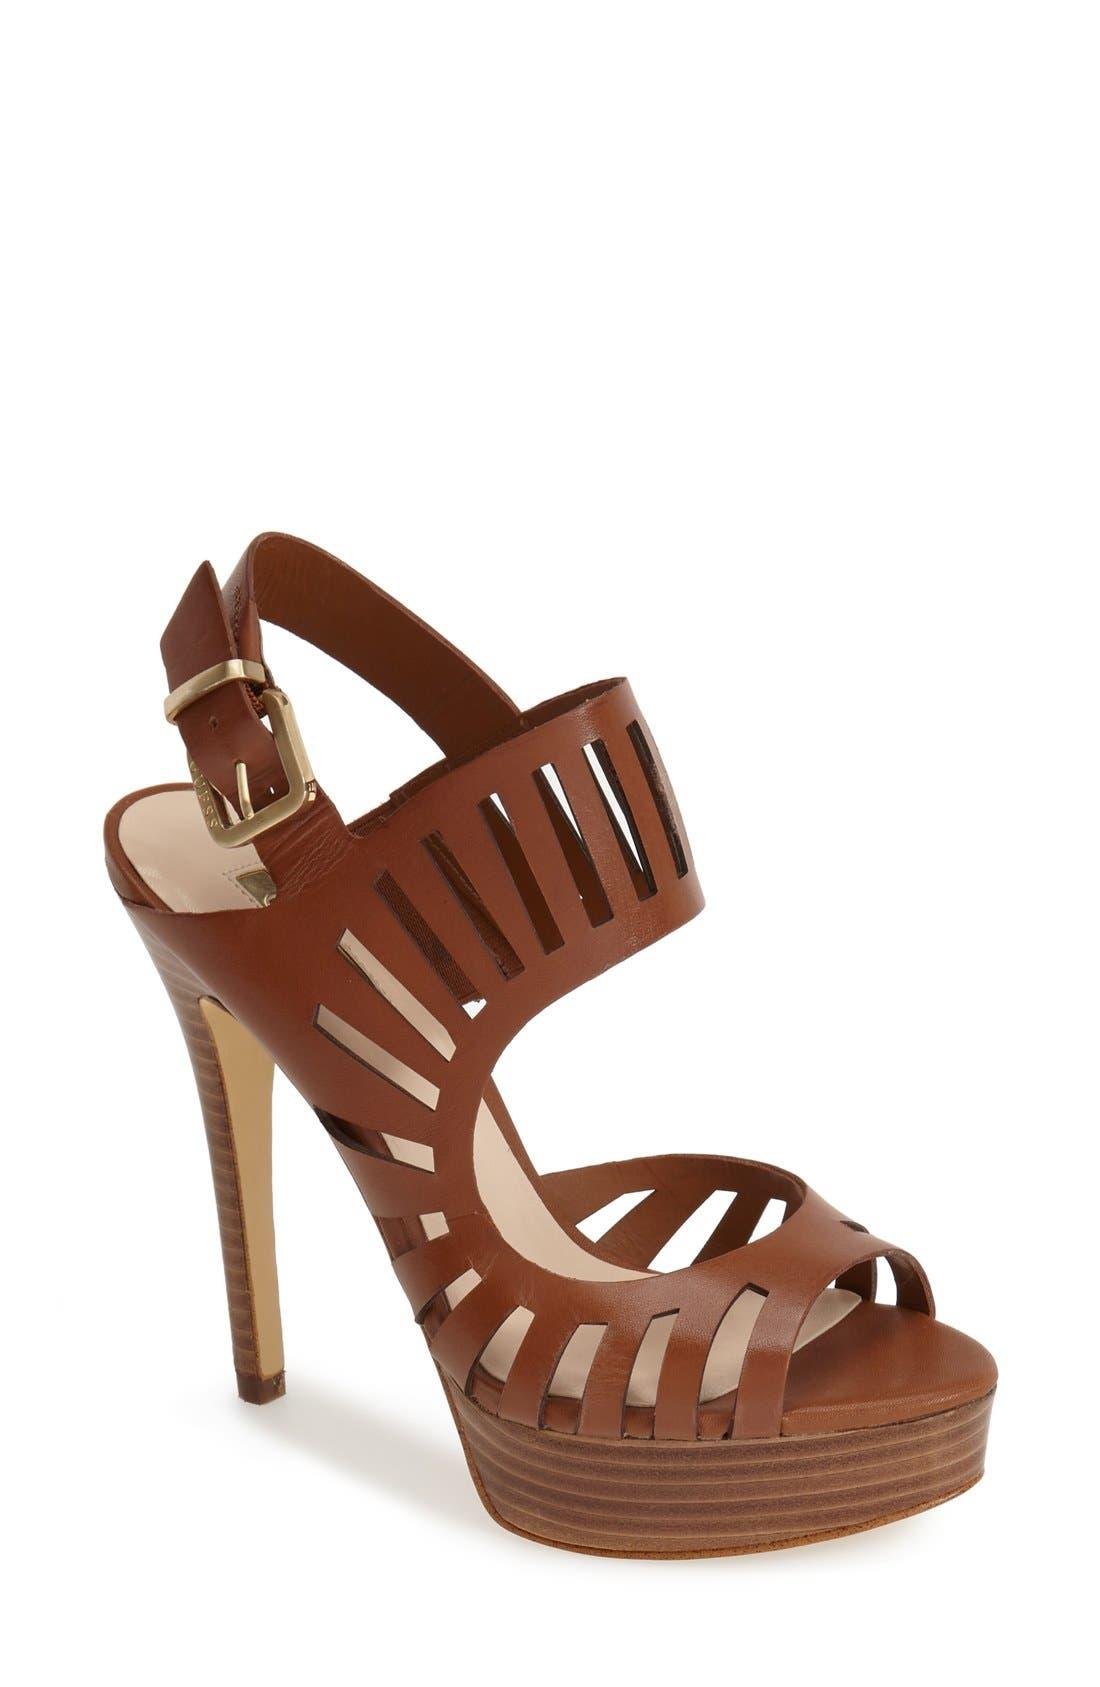 Alternate Image 1 Selected - GUESS 'Kabirra' Cutout Leather Platform Sandal (Women)